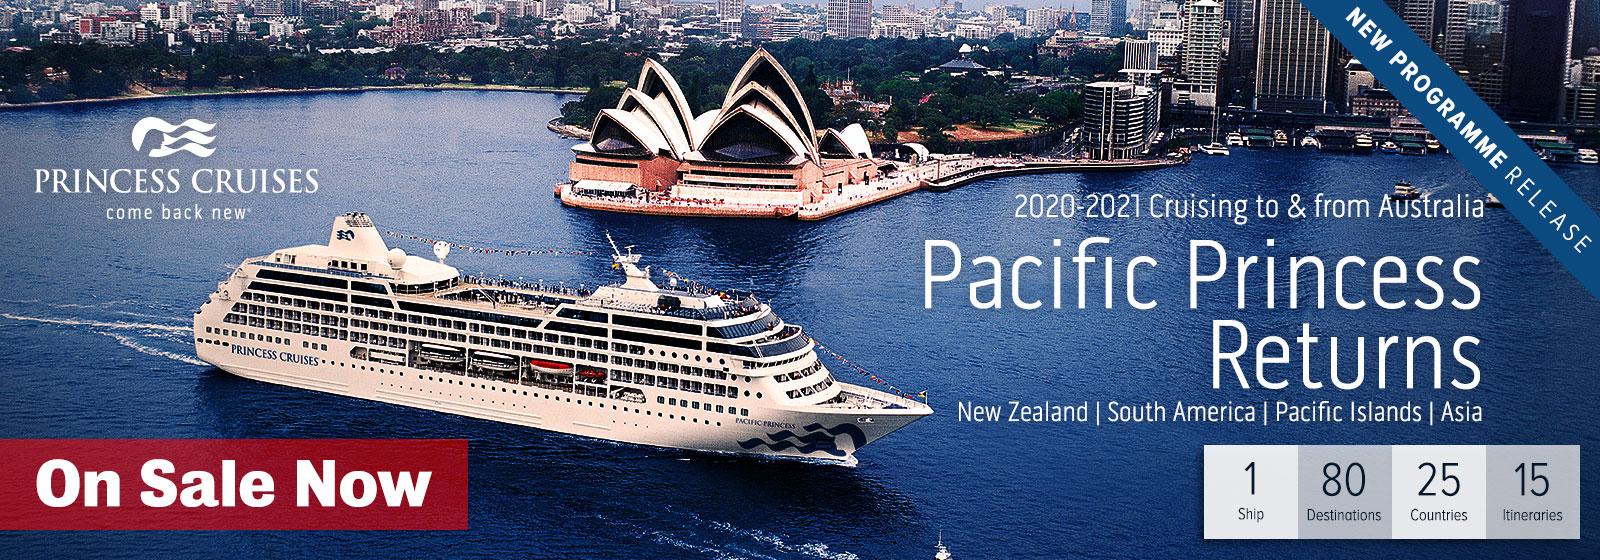 Pacific Princess Returns 20/21-new2